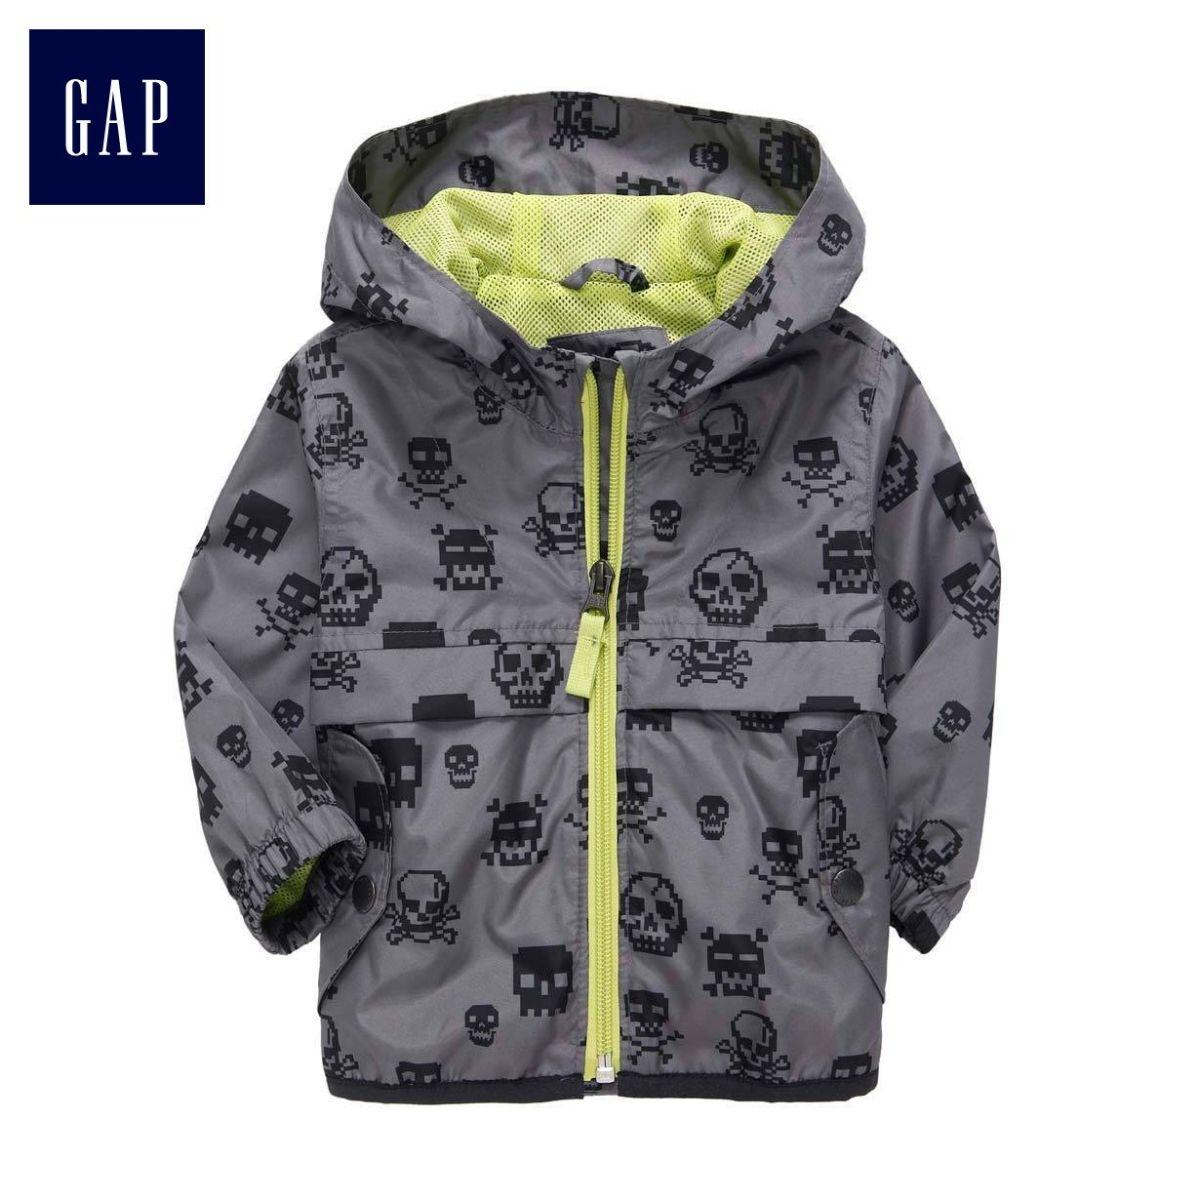 - 80% GAP Skull Anorak Grey 3 lata deszcz, wiatr